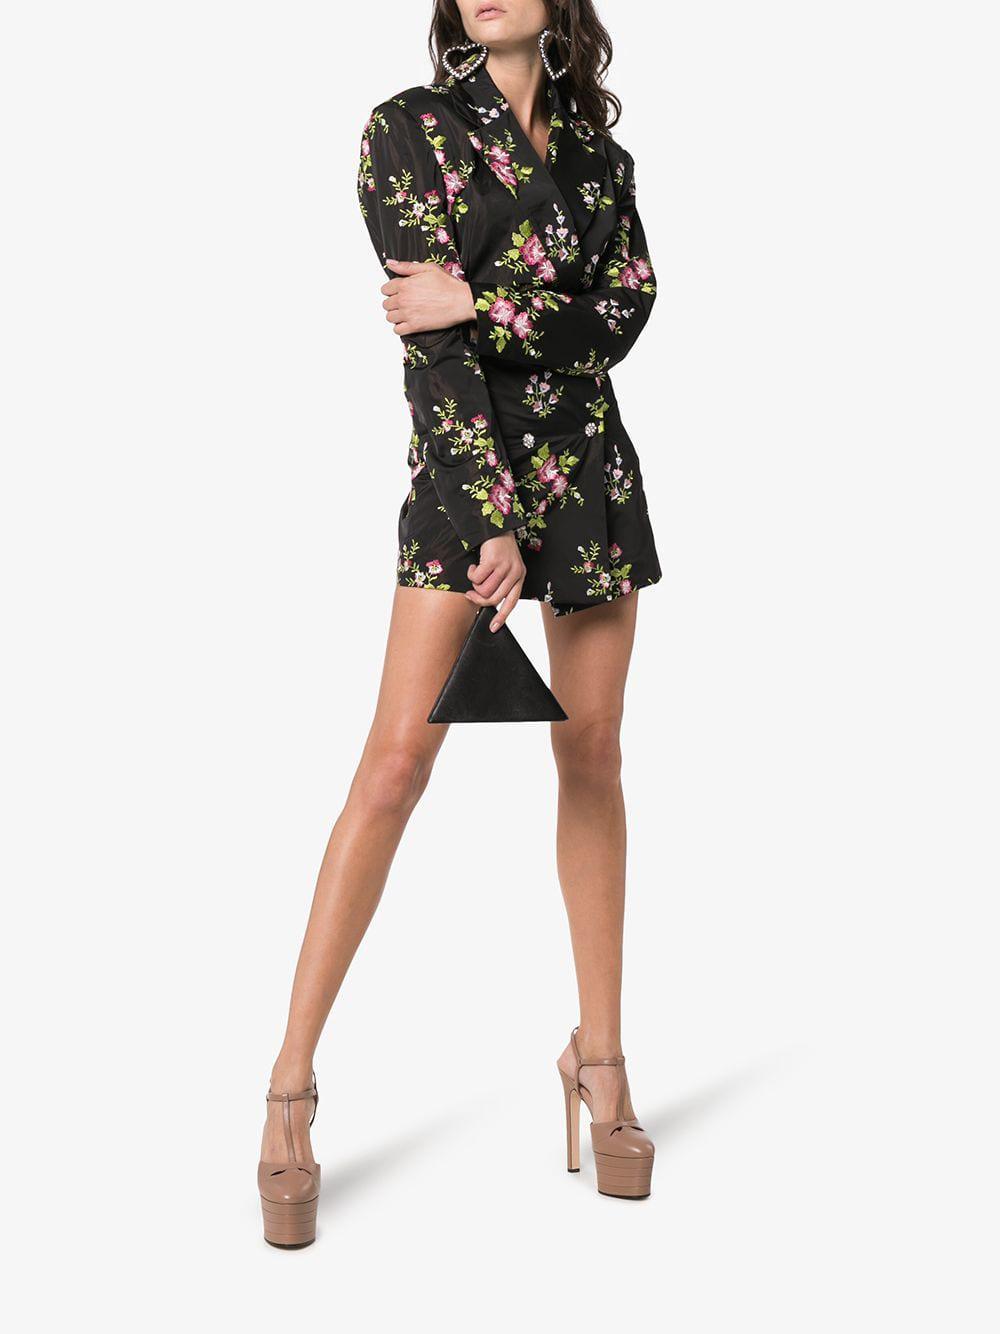 b0def8e727ce Gucci Porcelain Rose Stacked Platform Leather Heels - Lyst